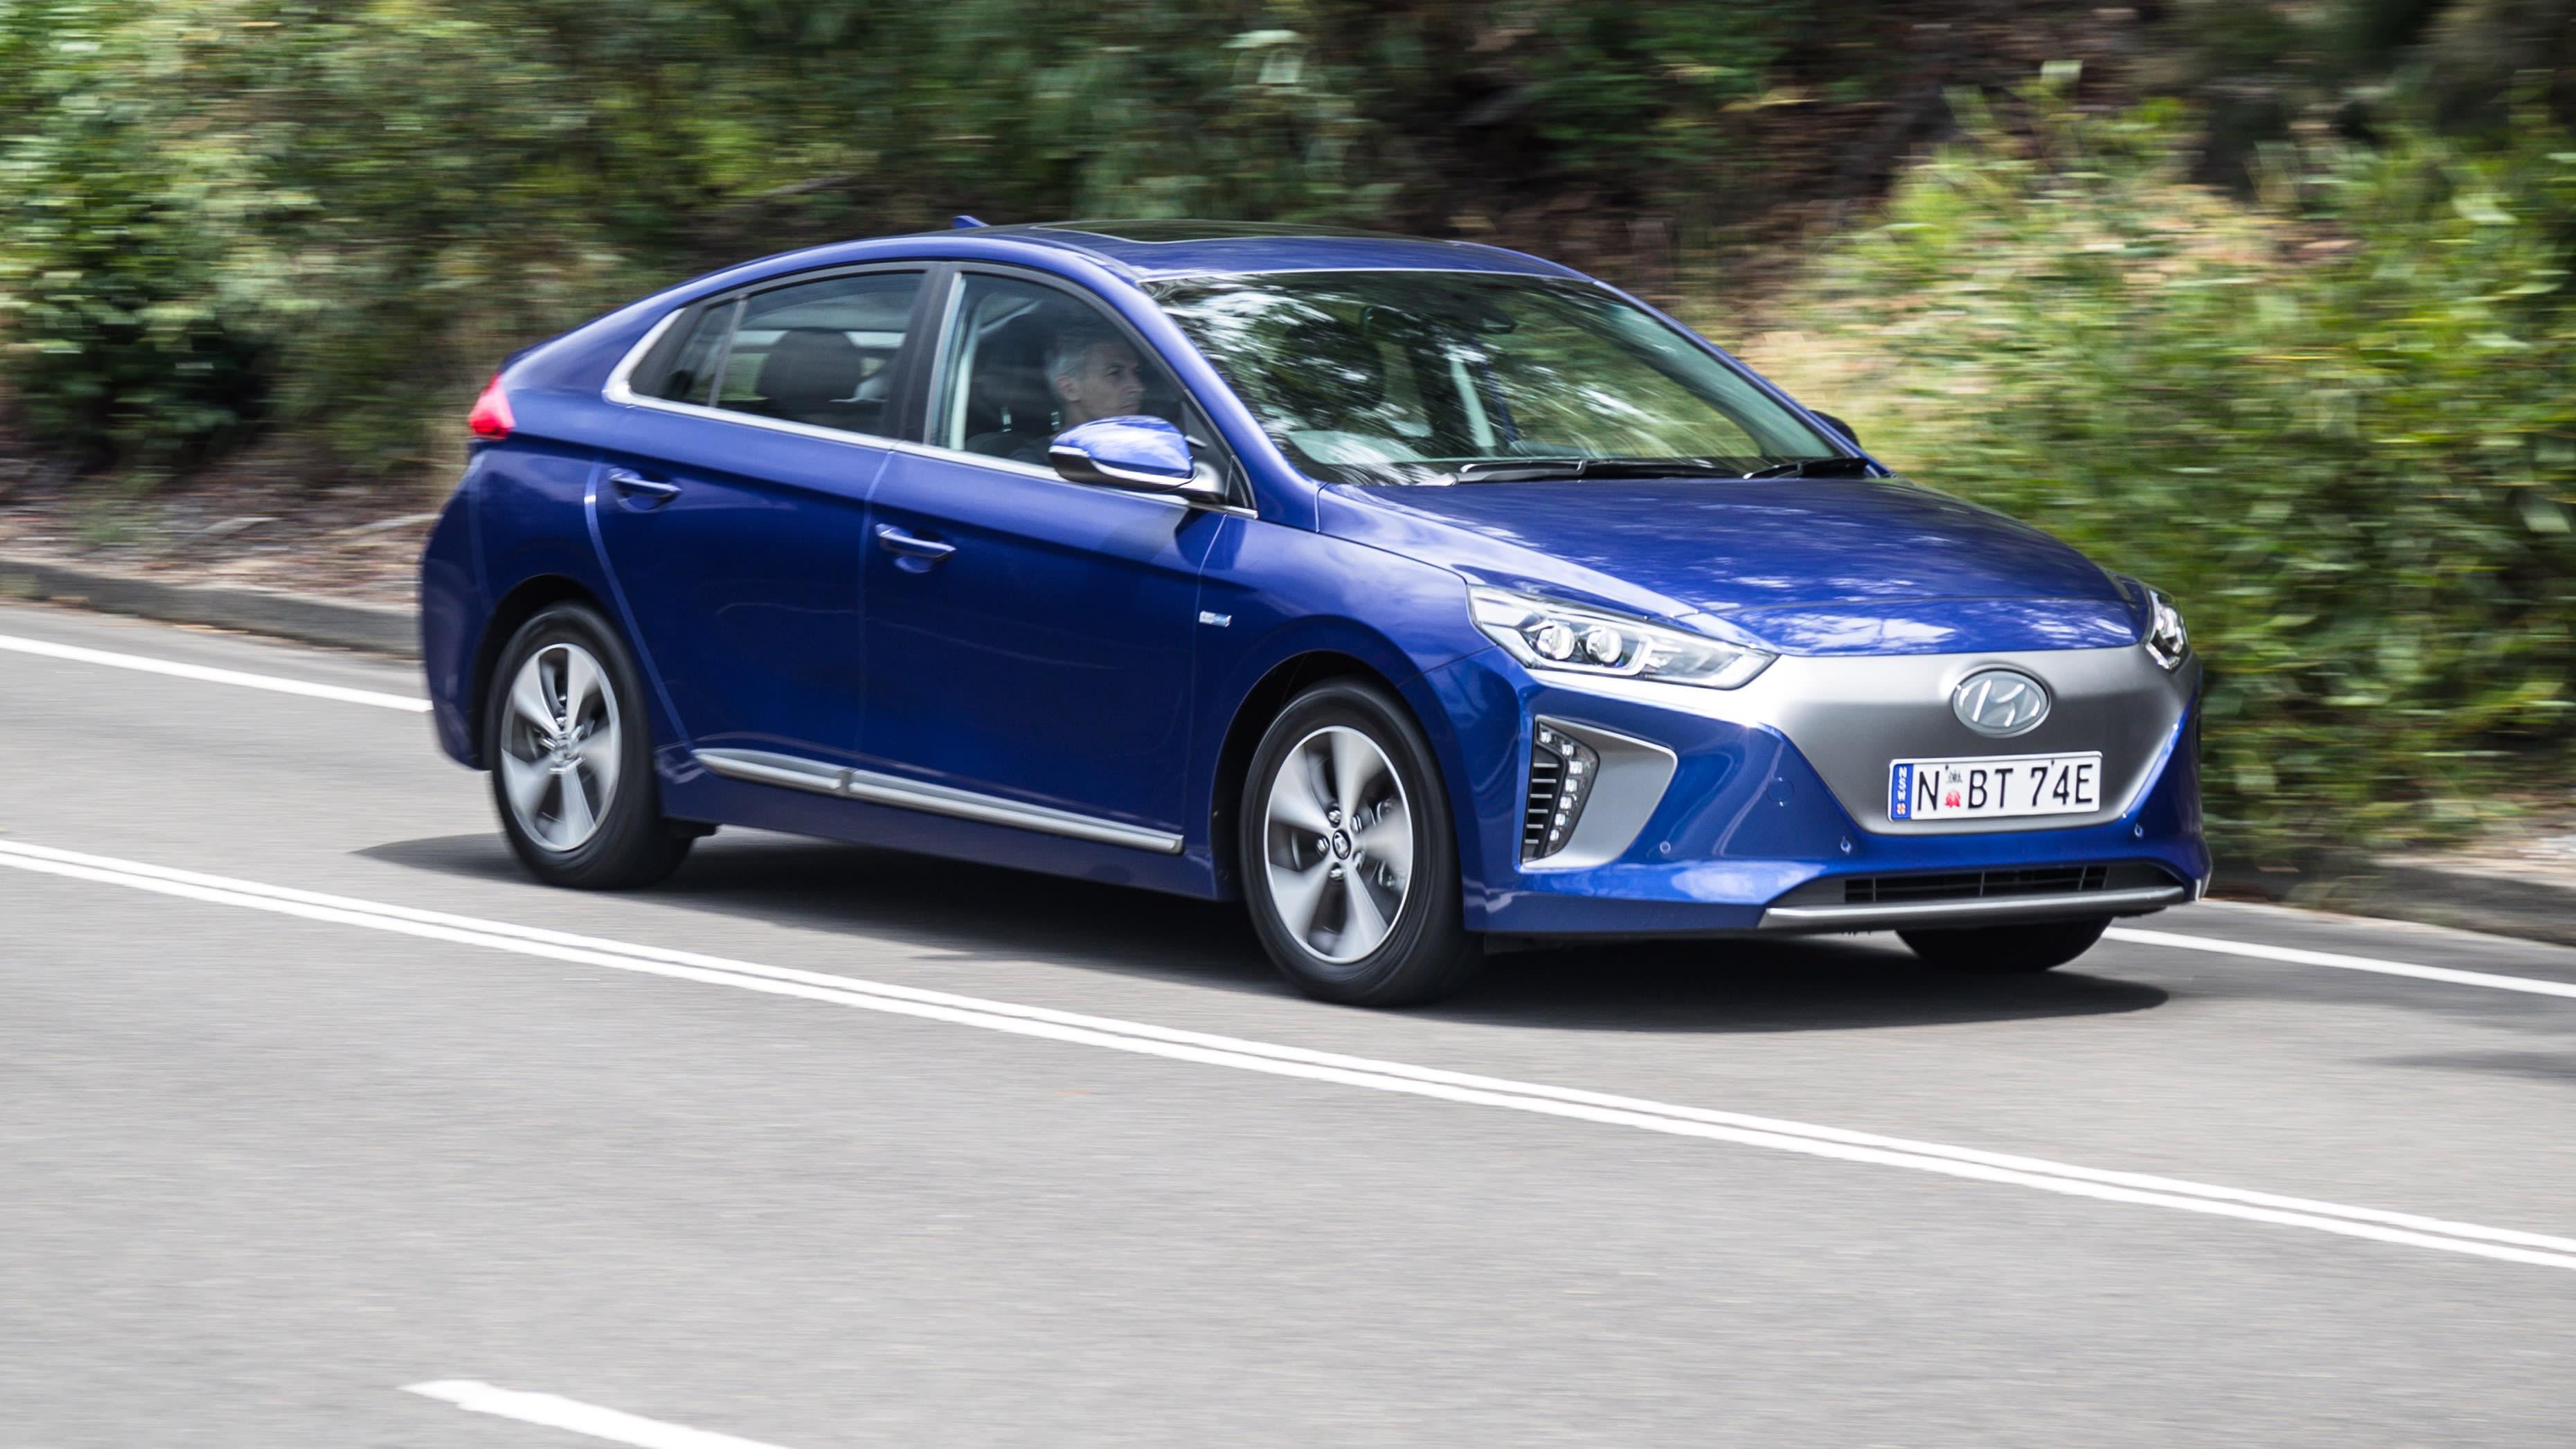 2019 Hyundai Ioniq Electric review